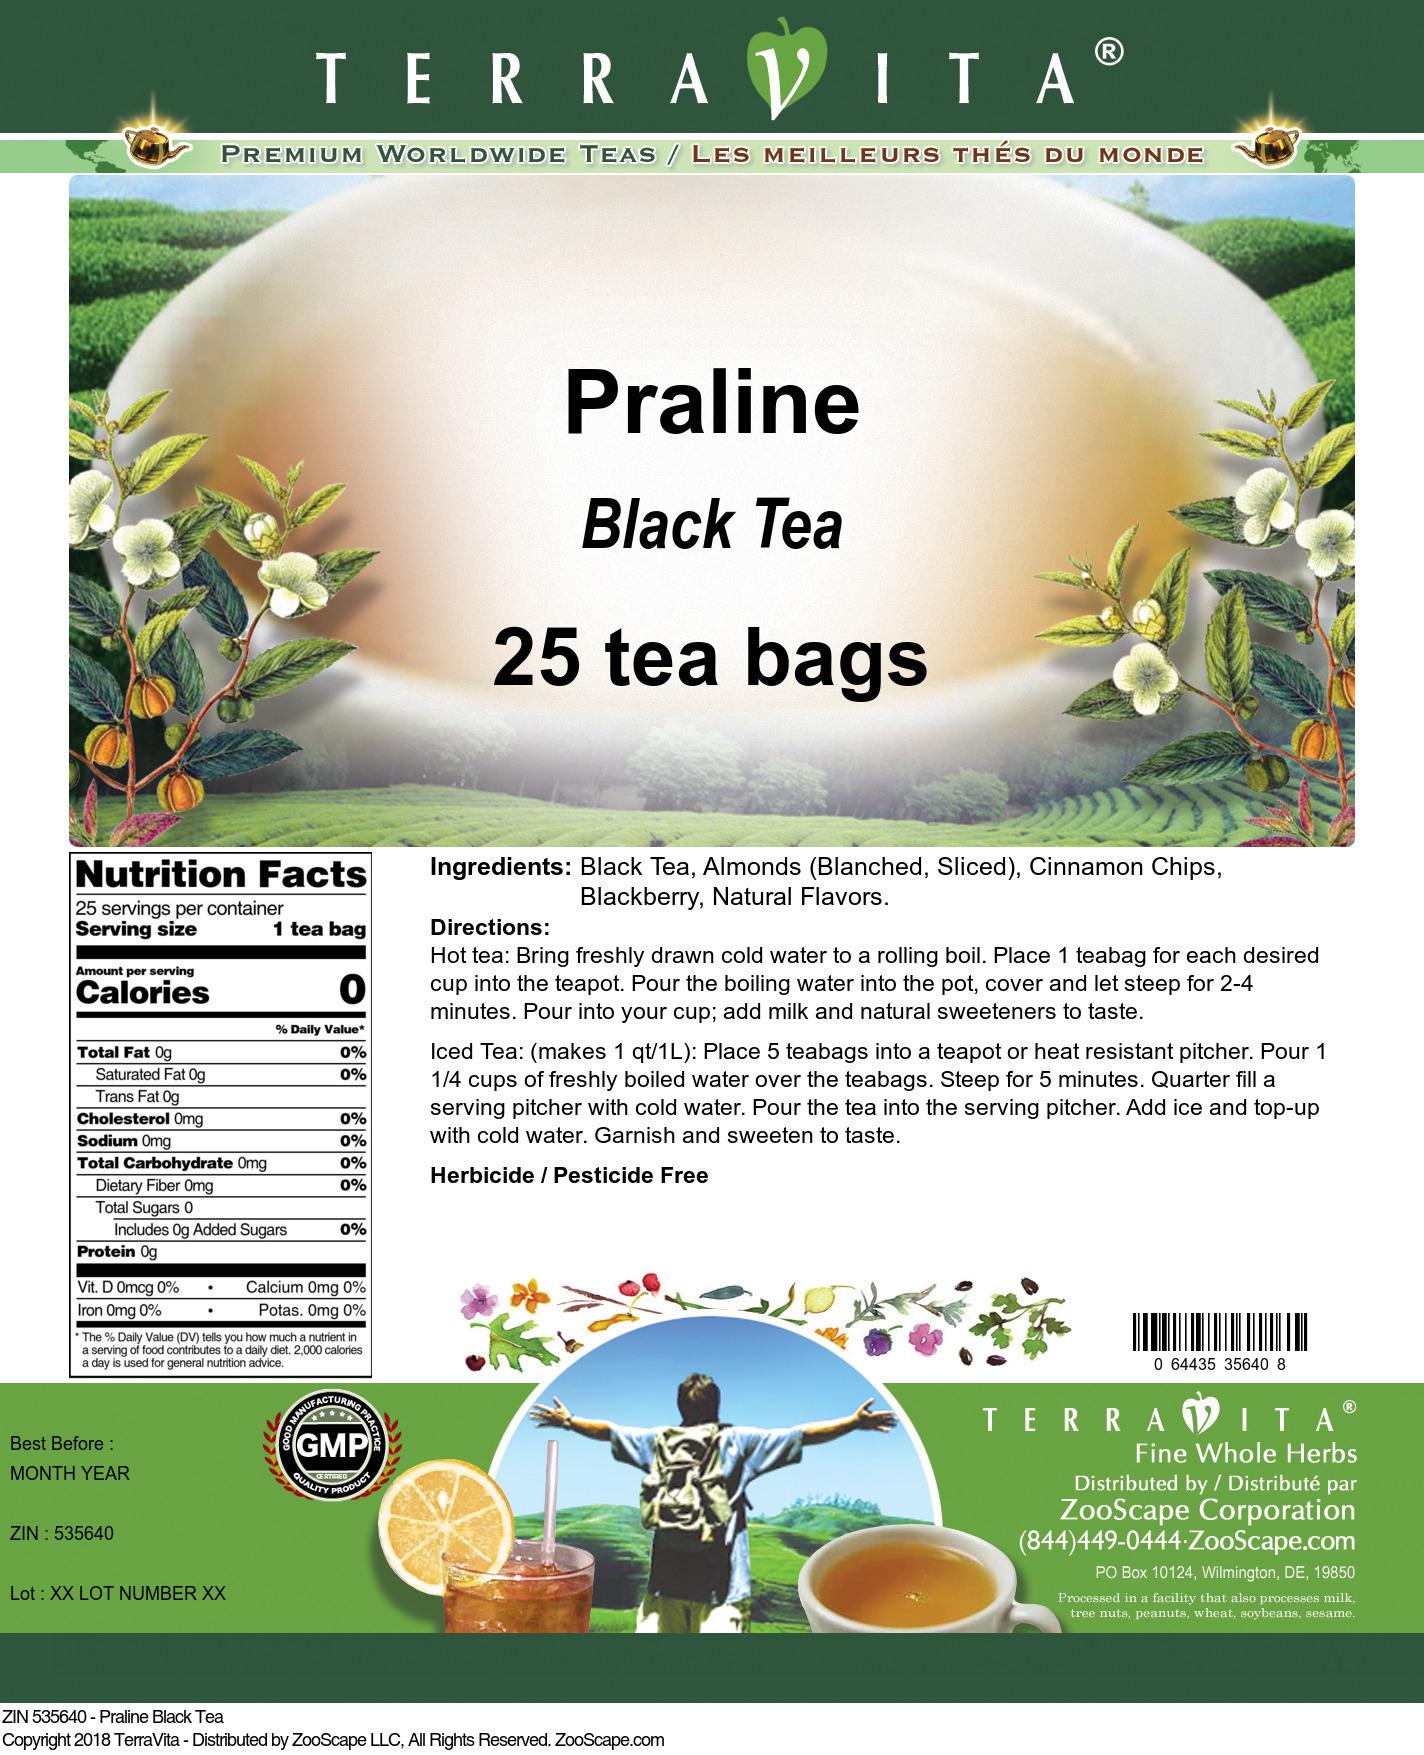 Praline Black Tea